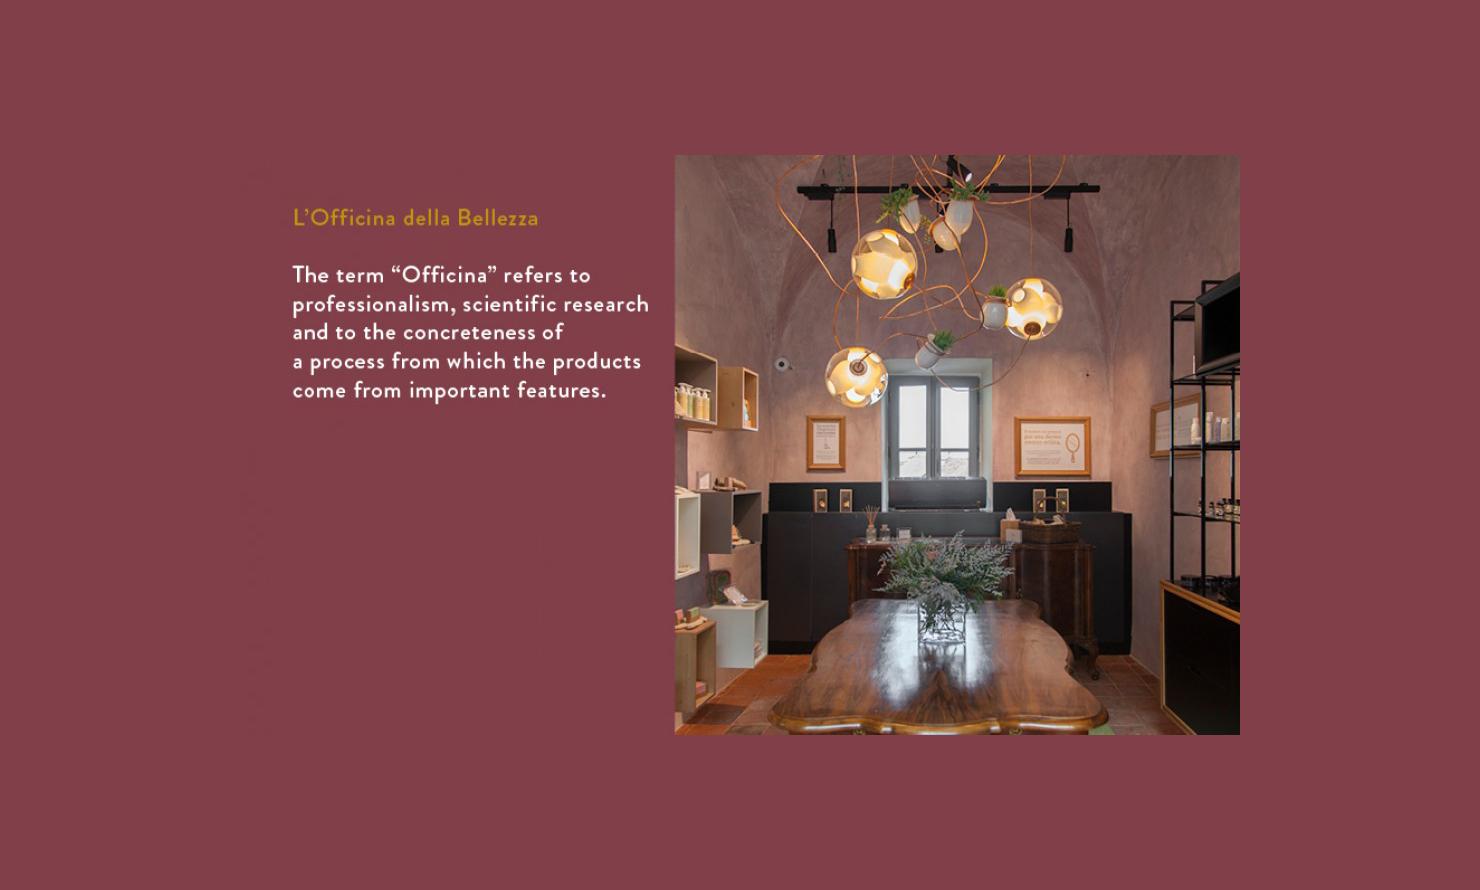 https://www.kubelibre.com/uploads/Slider-work-tutti-clienti/manital-vistaterra-la-corte-dei-mercanti-le-botteghe-di-vistaterra-12.jpg